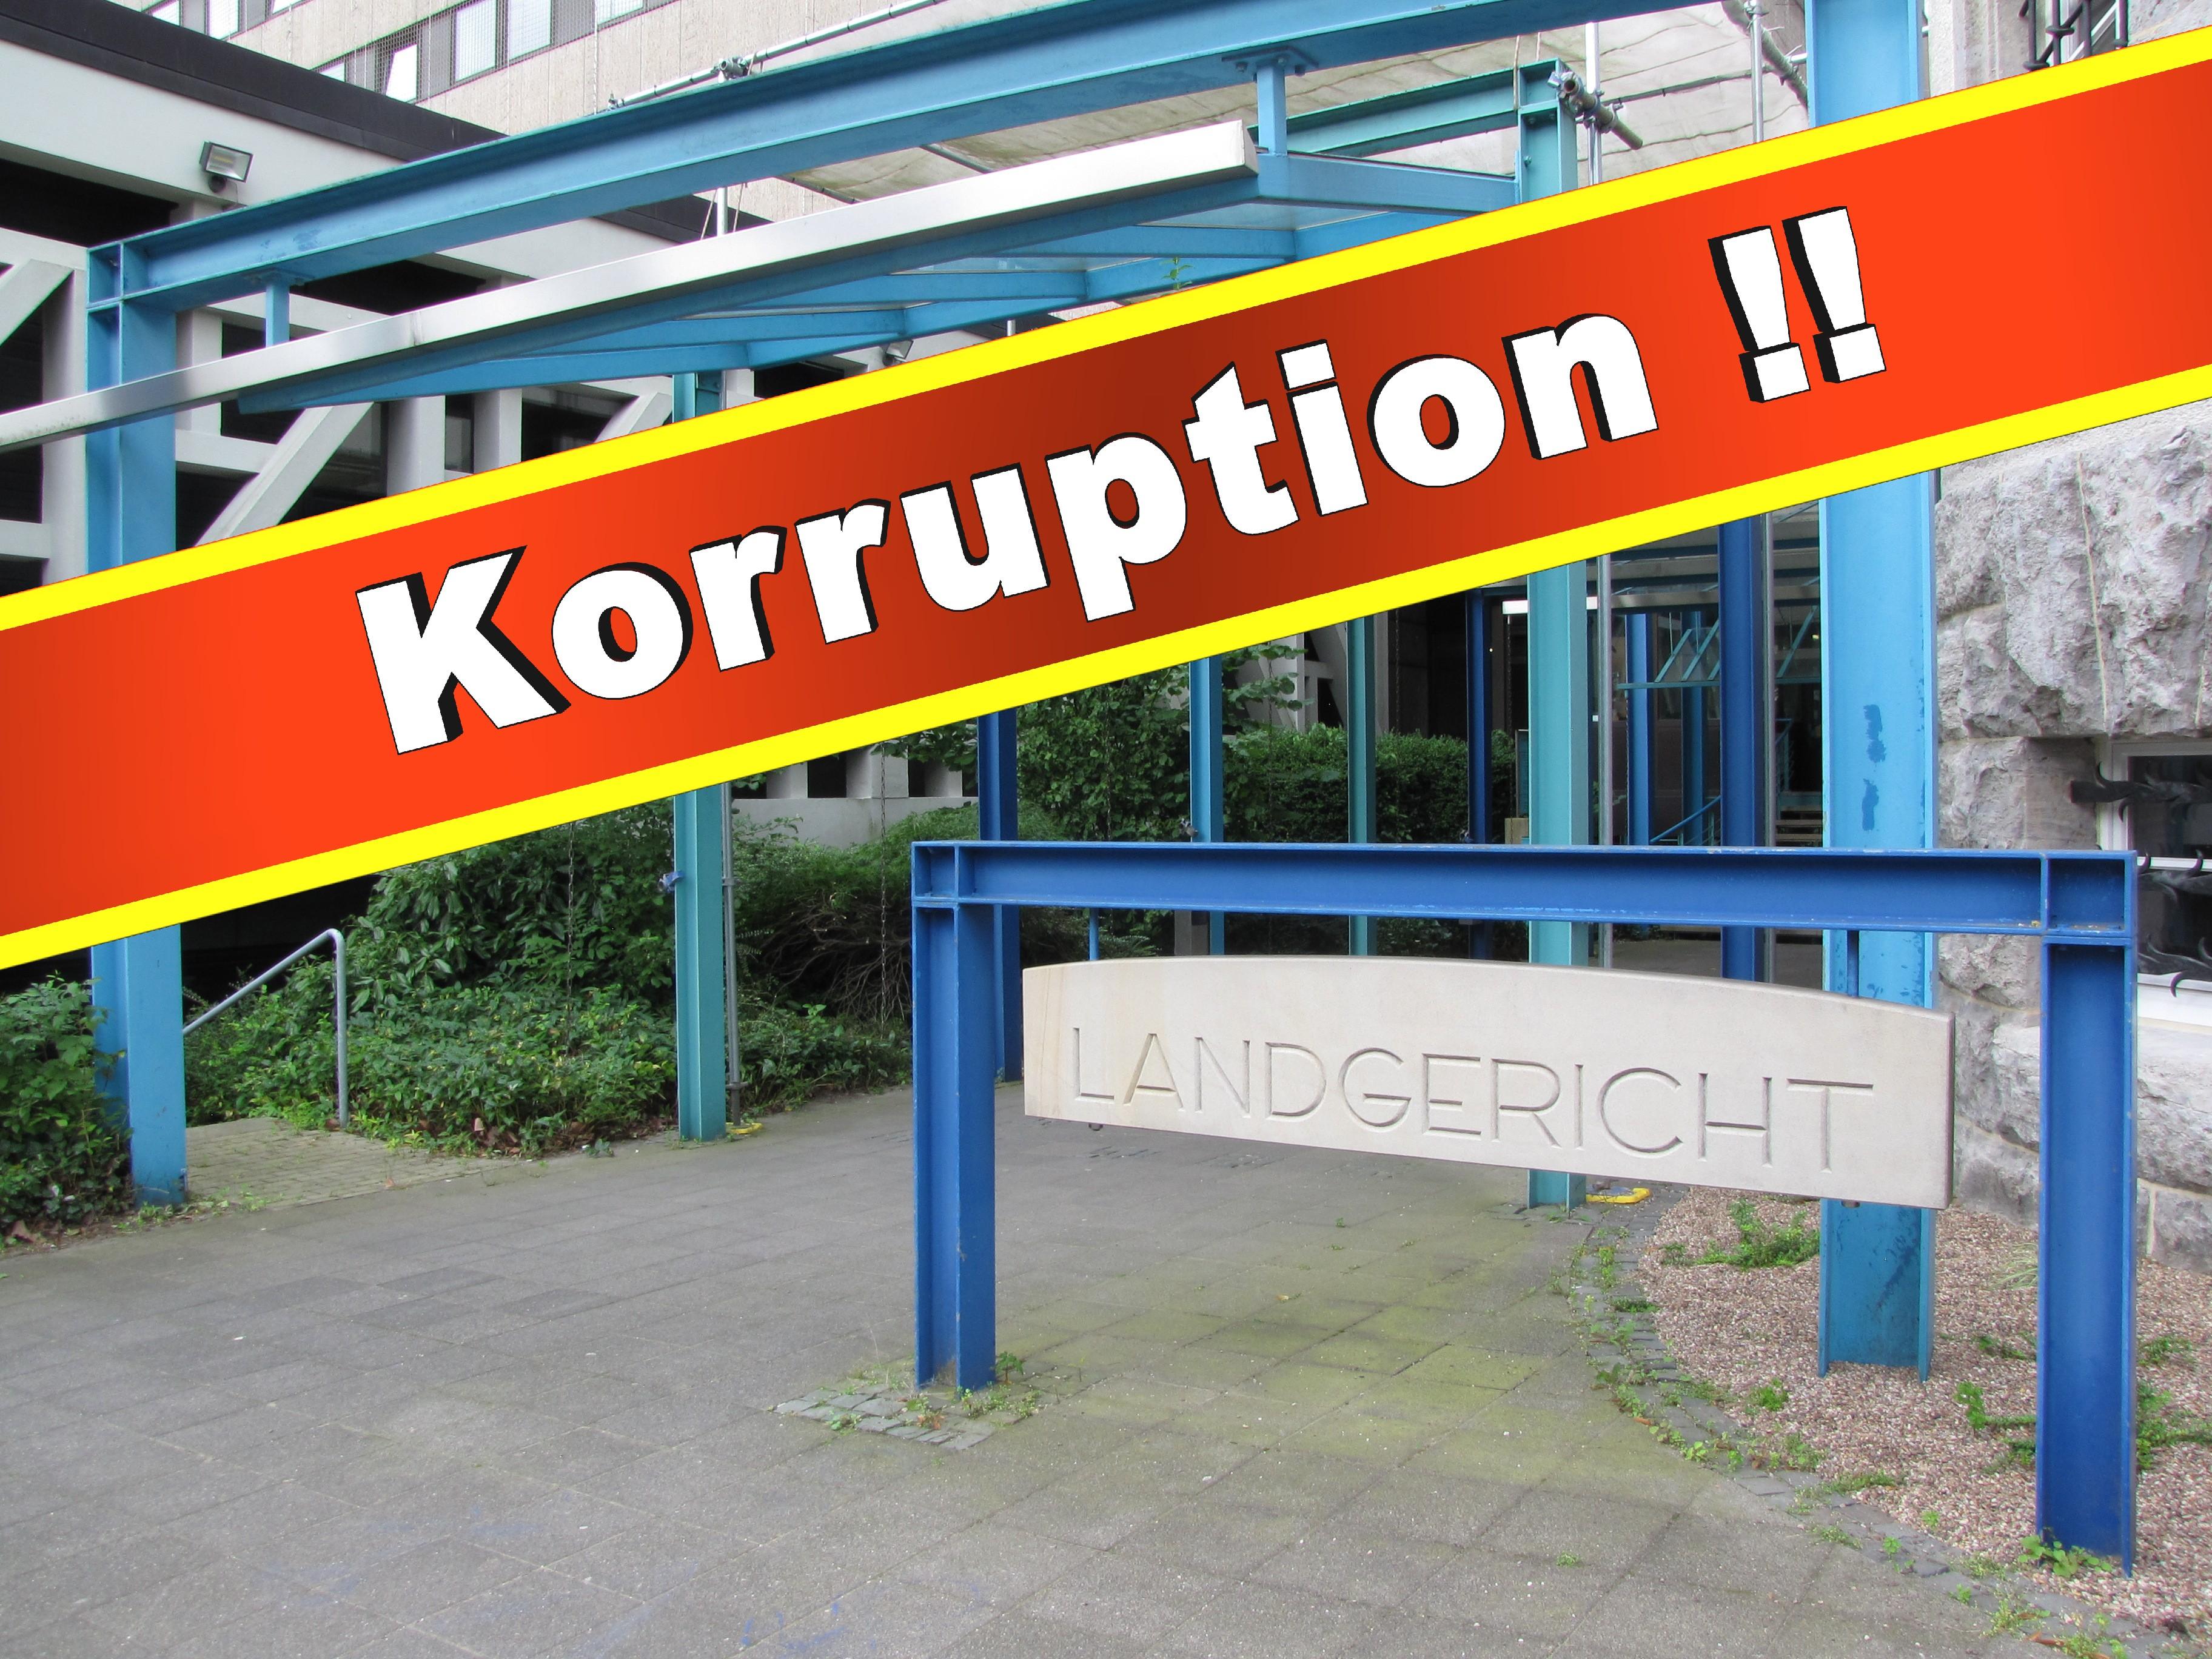 Landgericht Bielefeld Klaus Petermann (37)